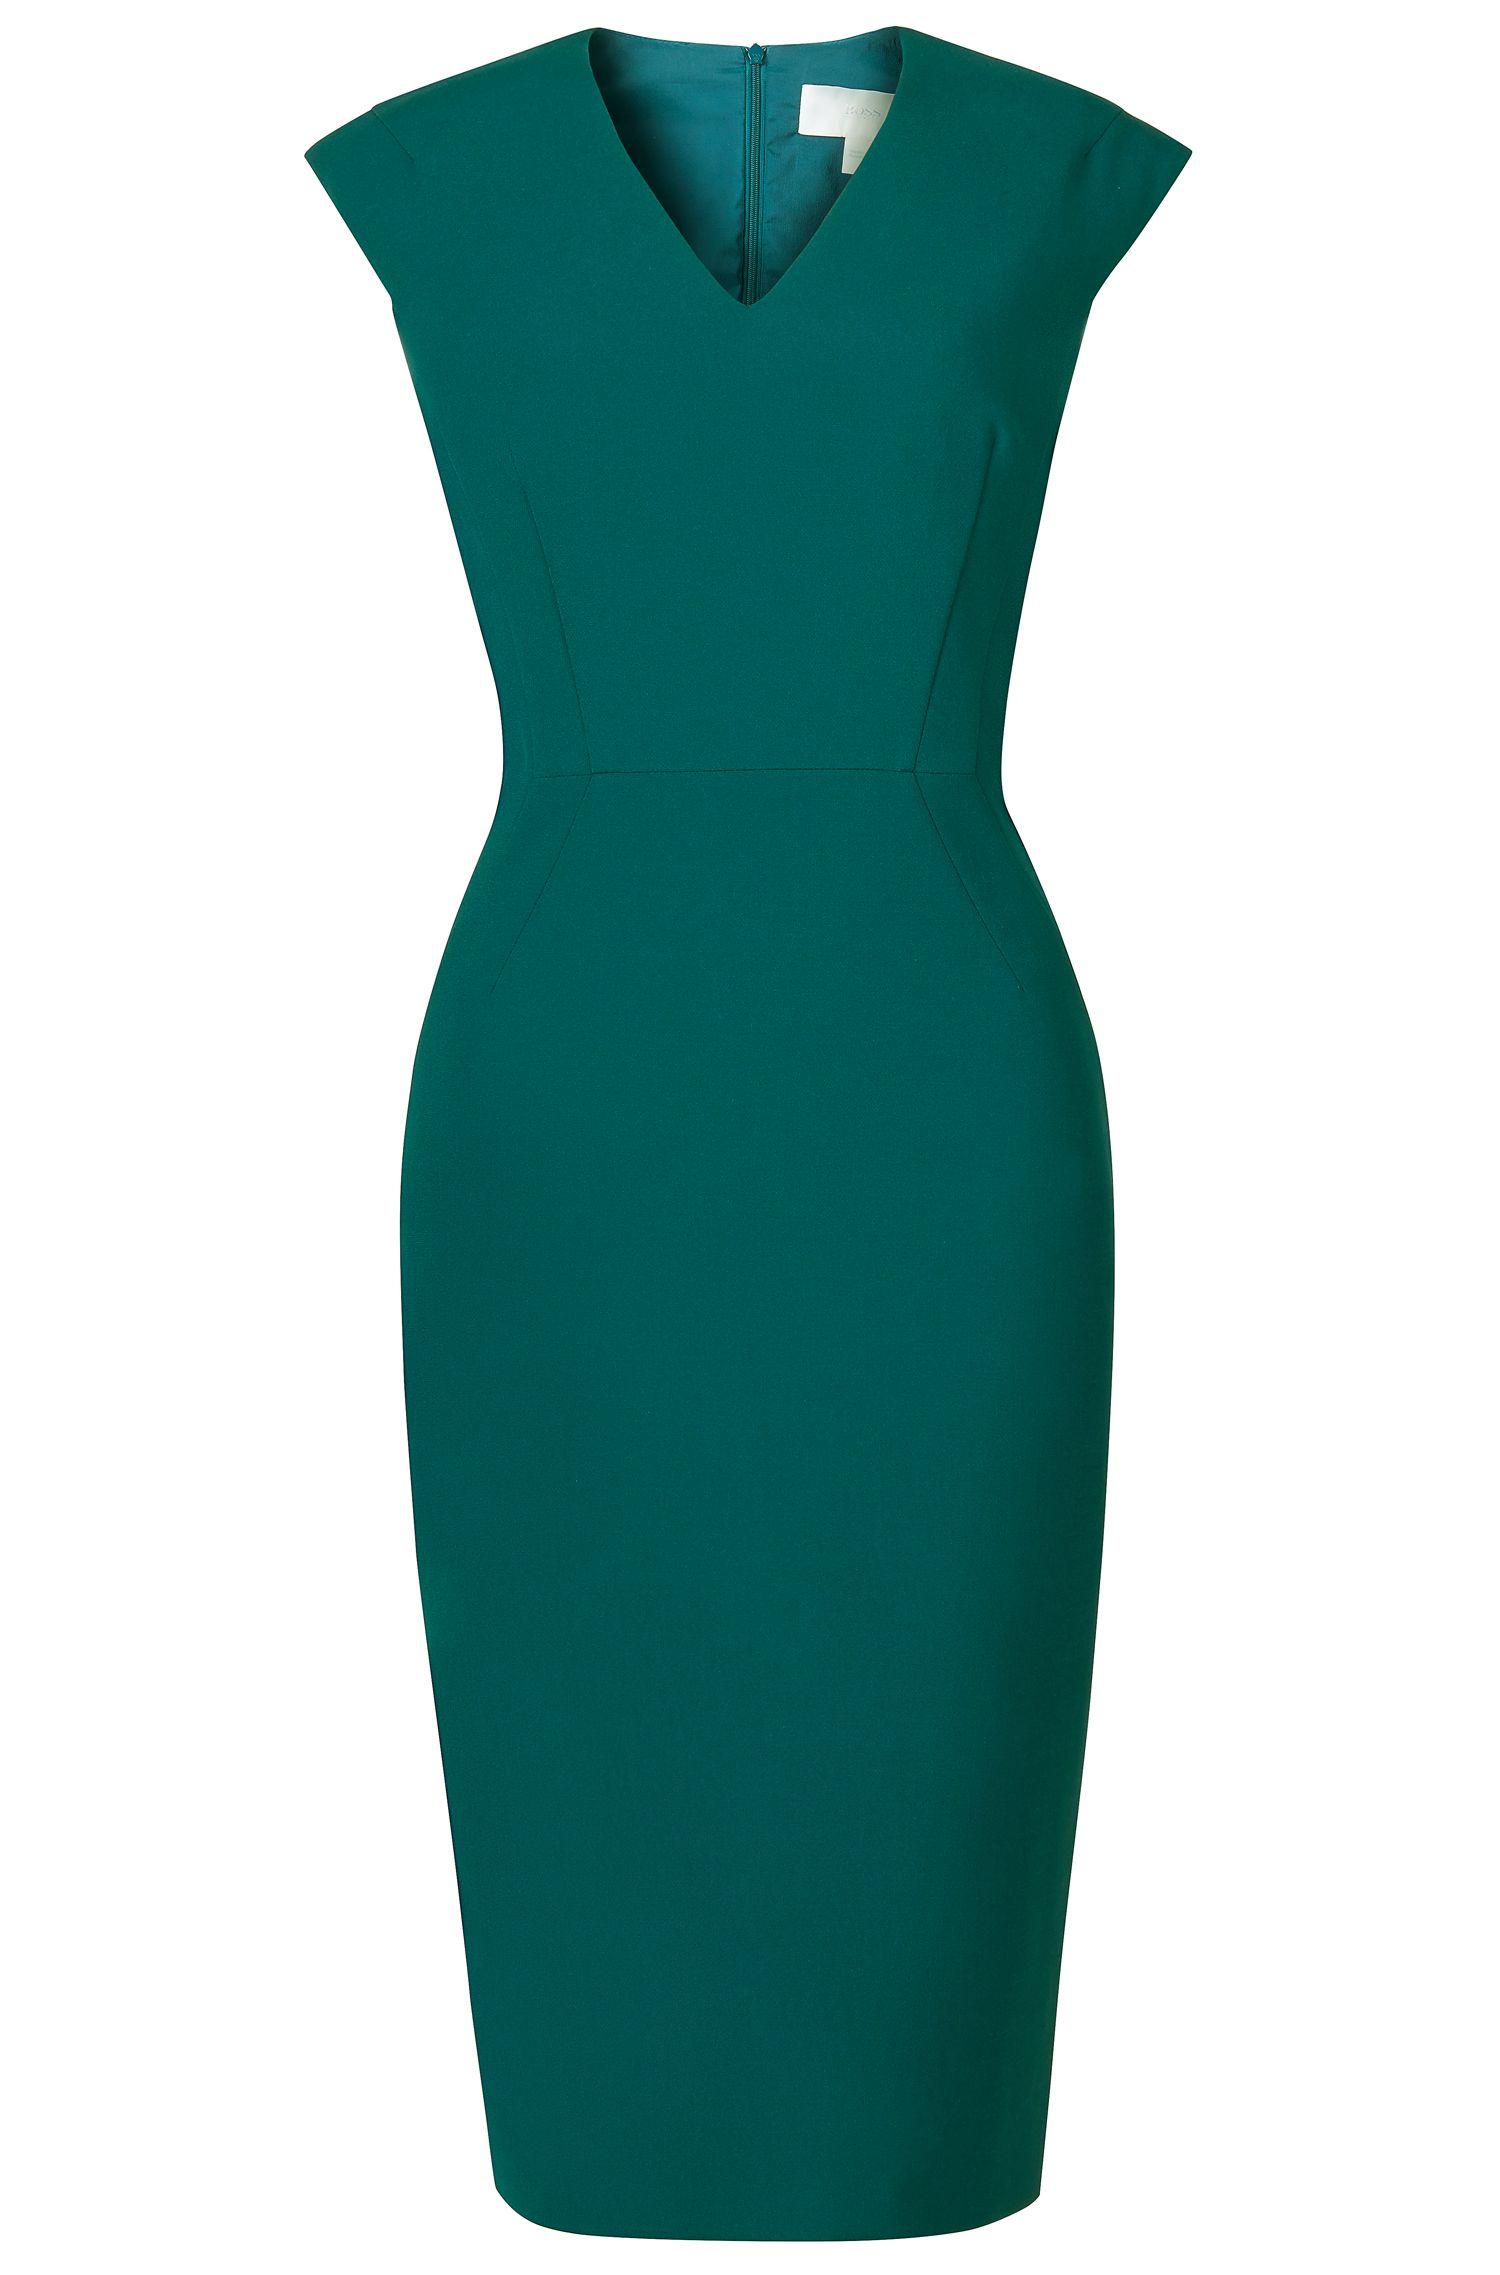 'Dalana' | Stretch Cotton Blend Sheath Dress